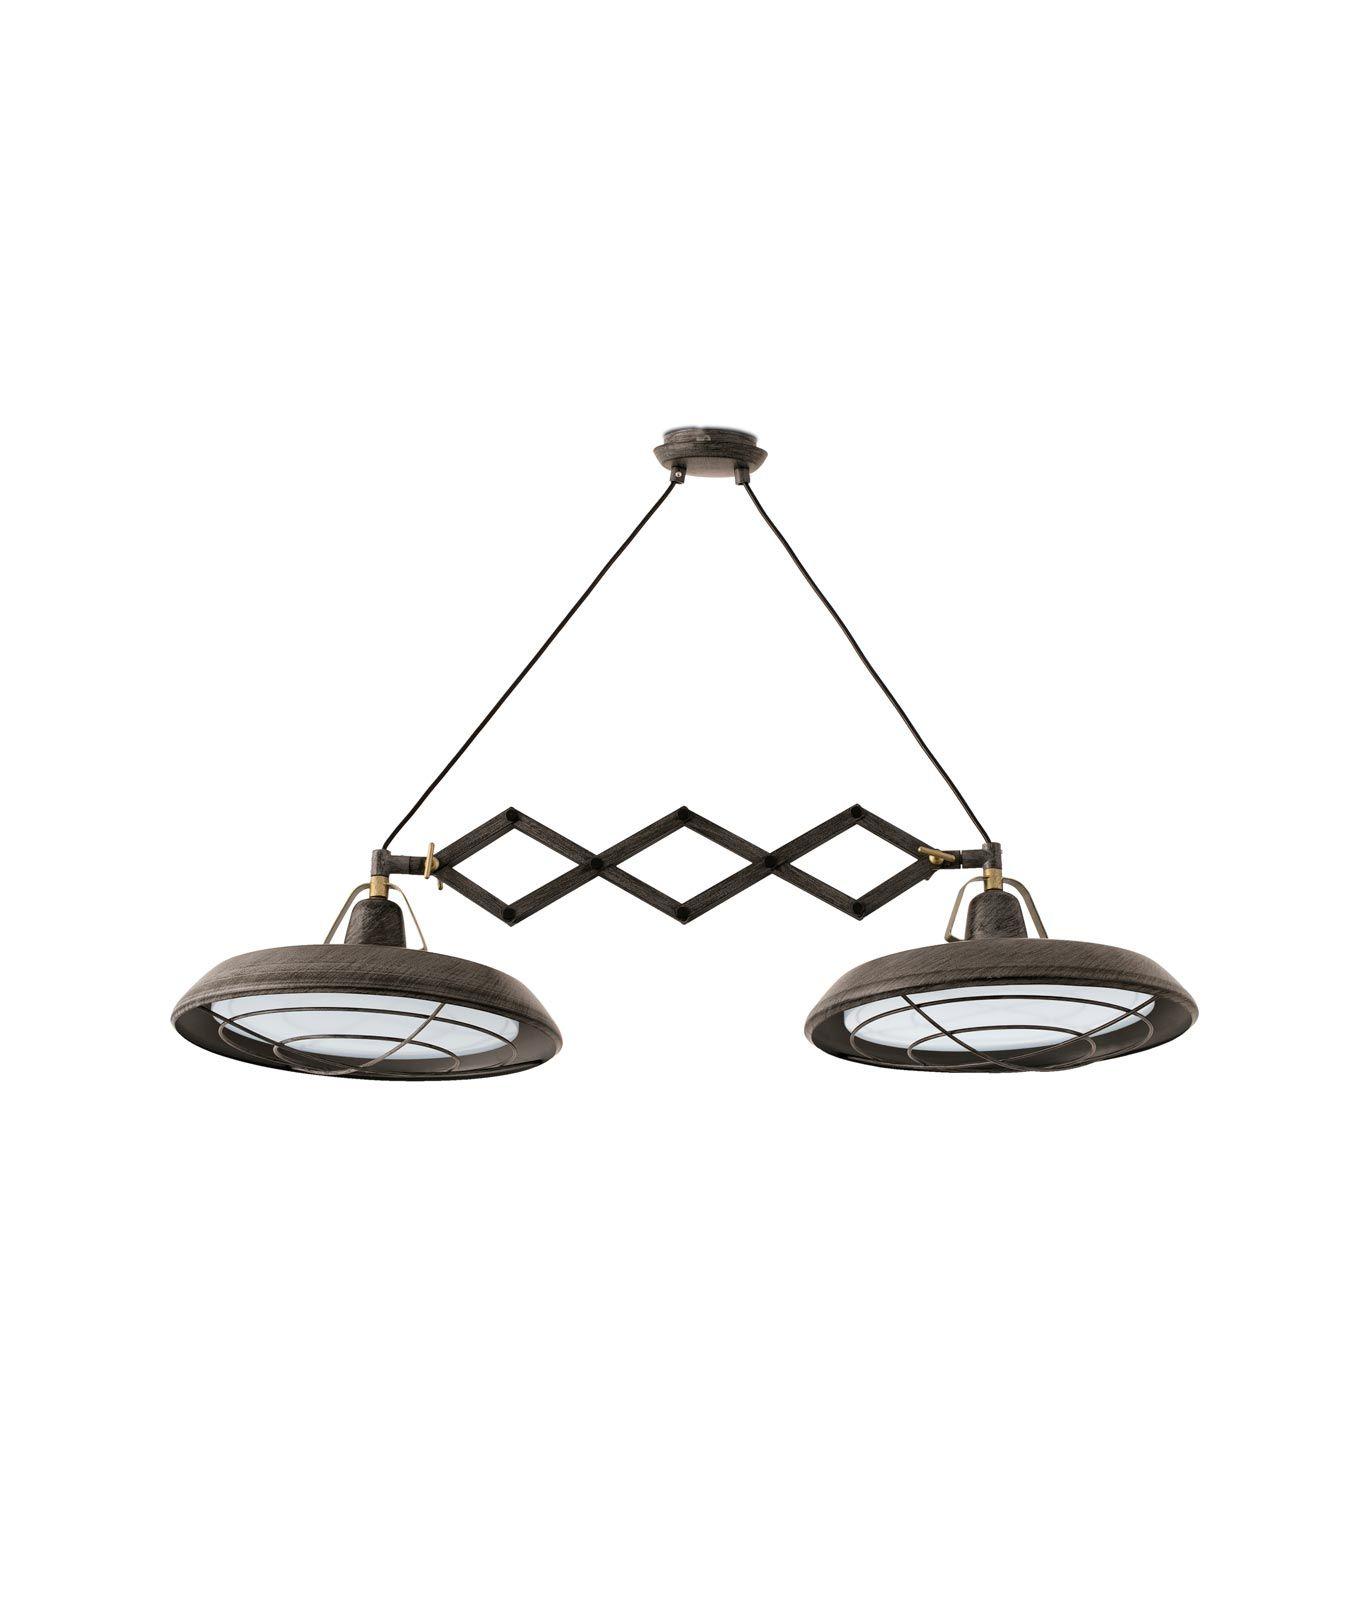 Lámpara extensible LED marrón PLEC 2 luces detalle 2